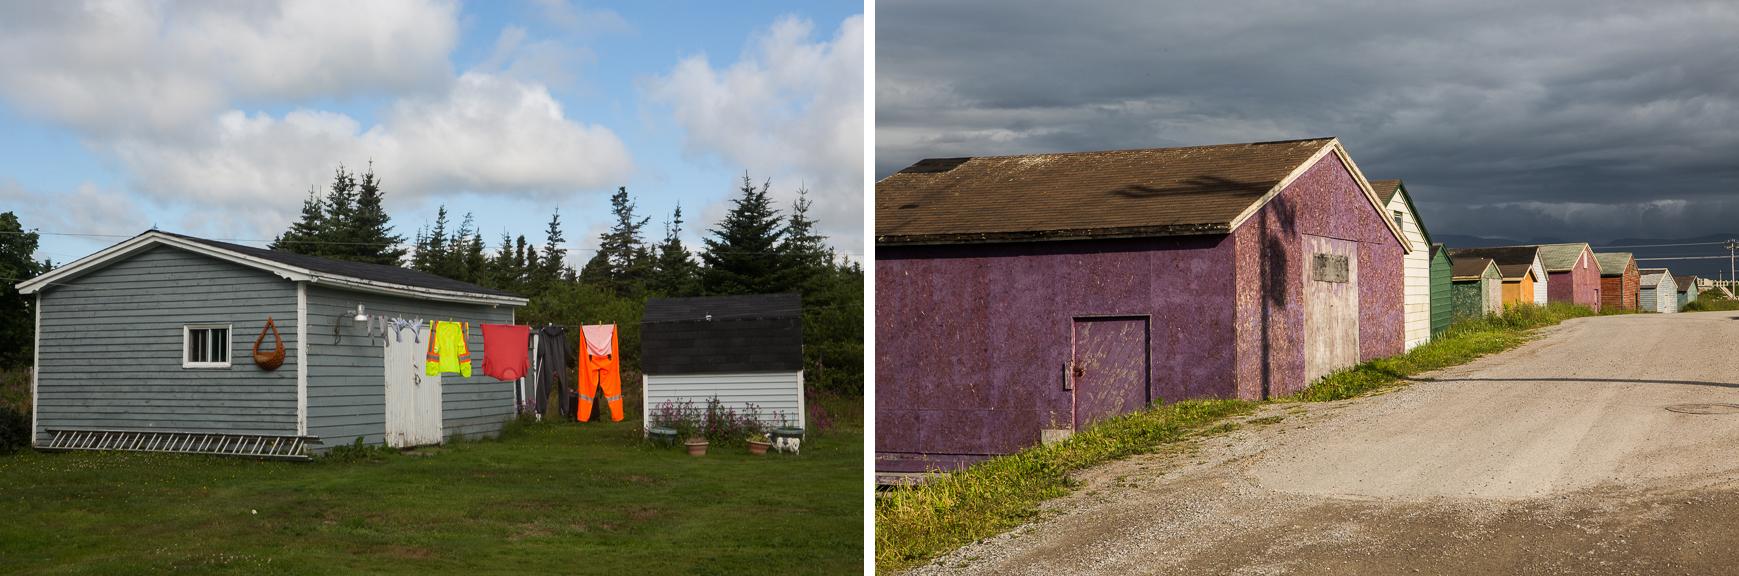 Clothesline, Avalon Peninsula; Fishing shacks, Northern Peninsula